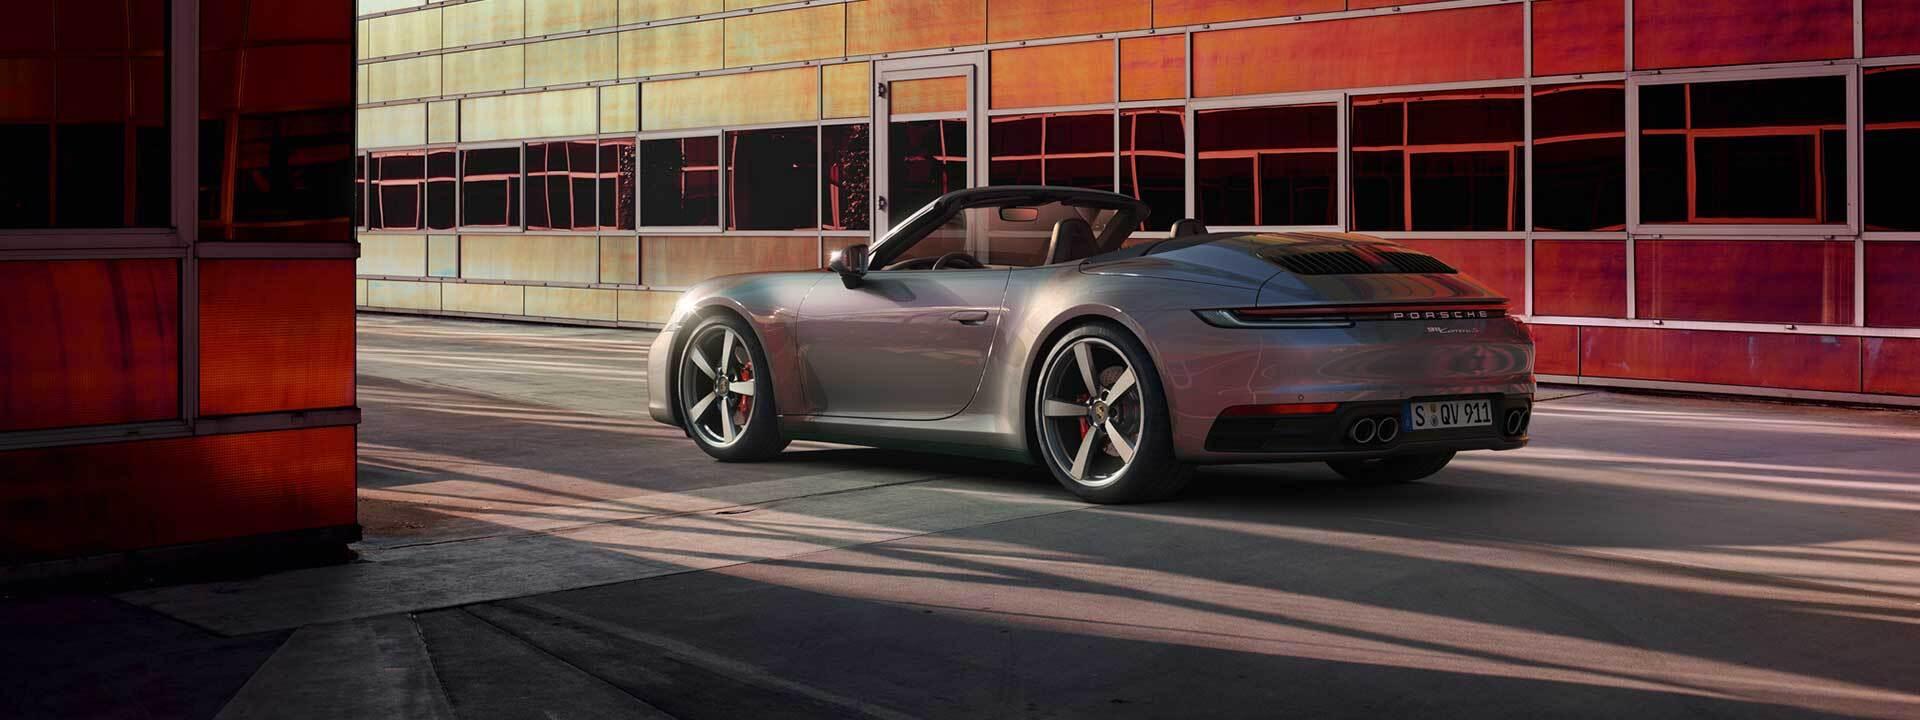 A Porsche in Kansas City, KS